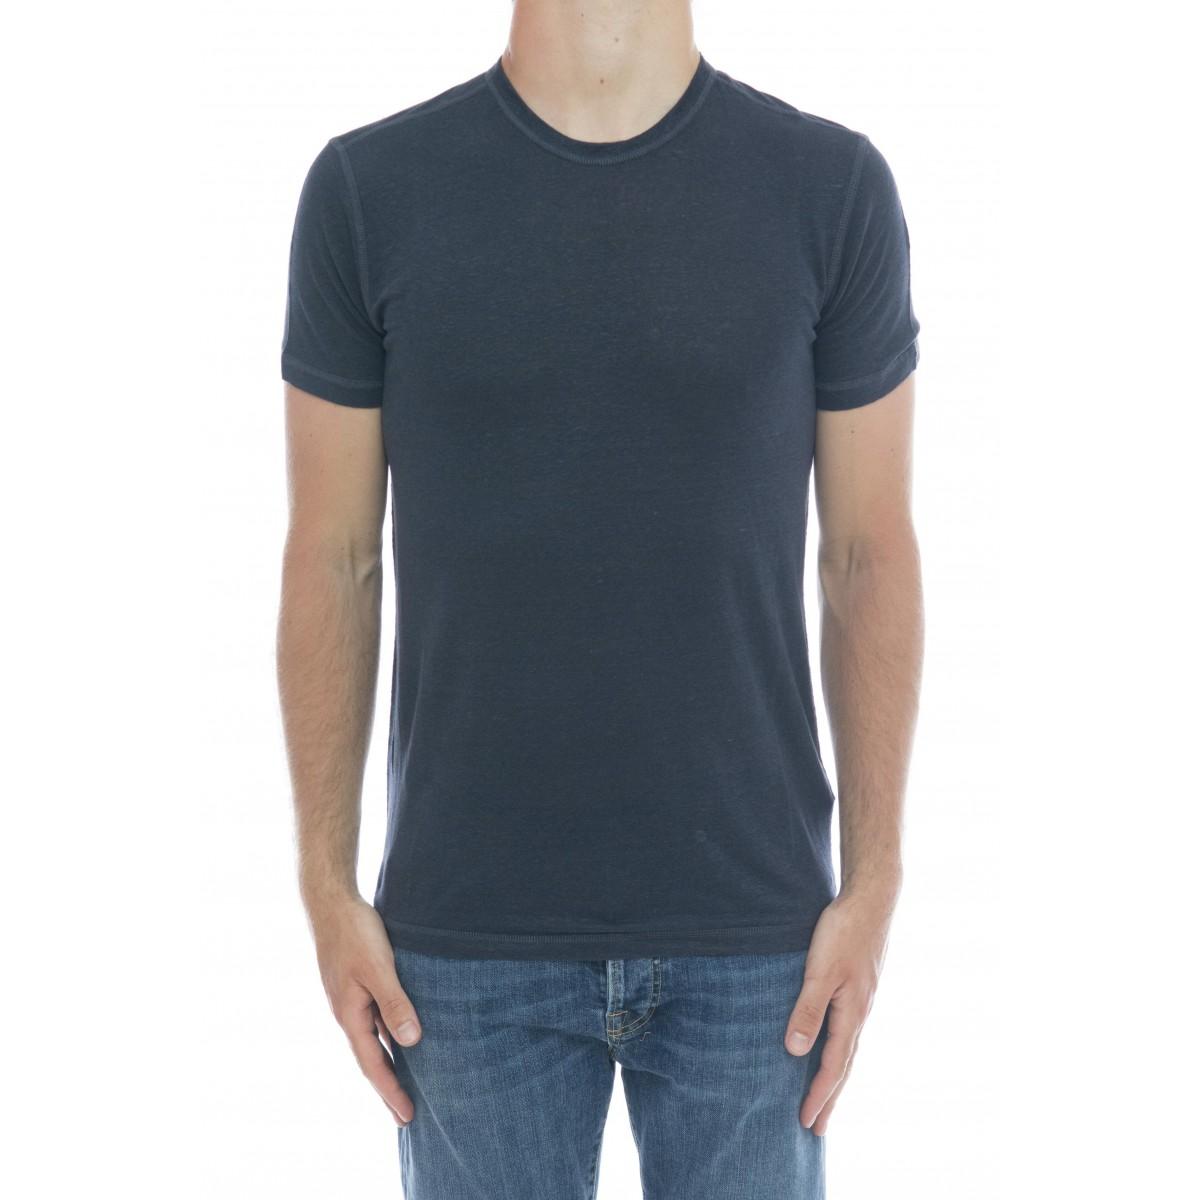 T-shirt - Hts040 m511 t-shirt lino giro